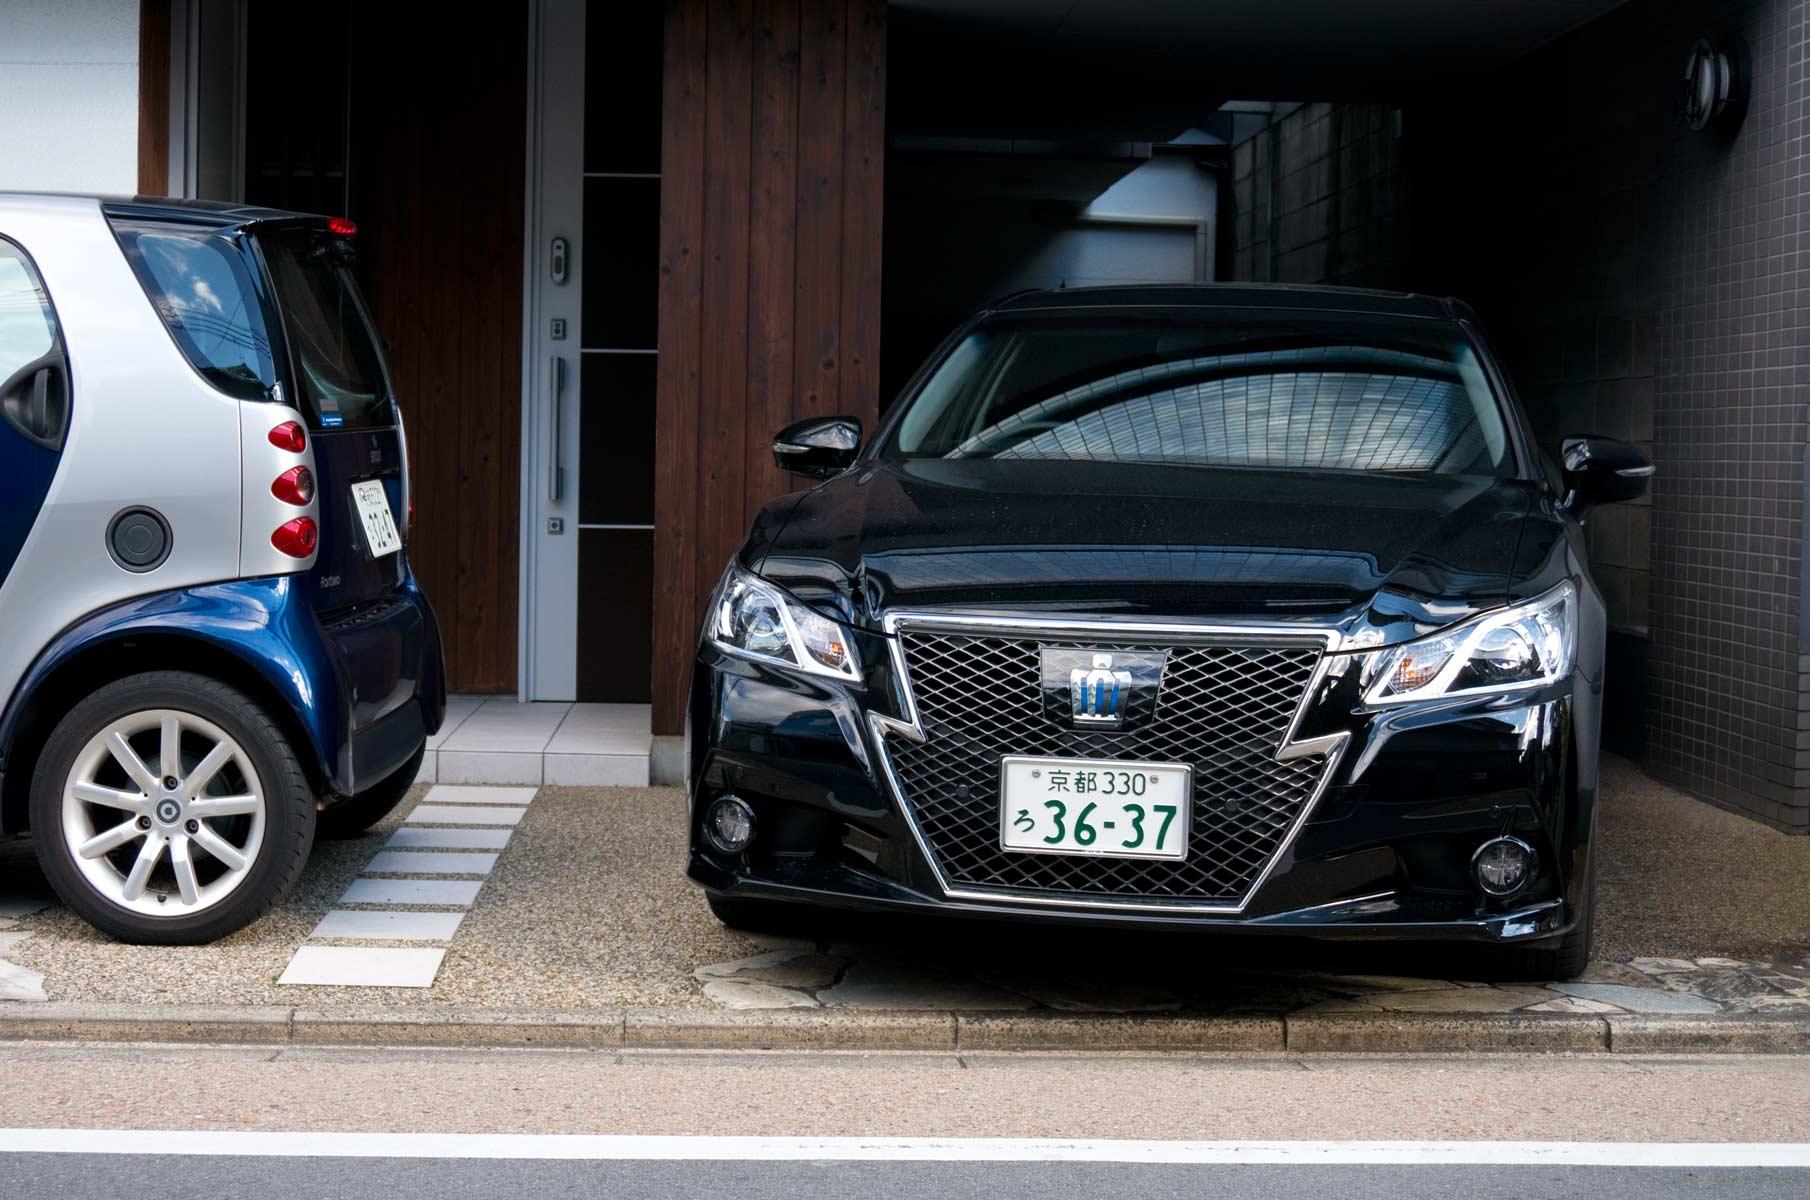 Toyota Crown in Osaka, Japan